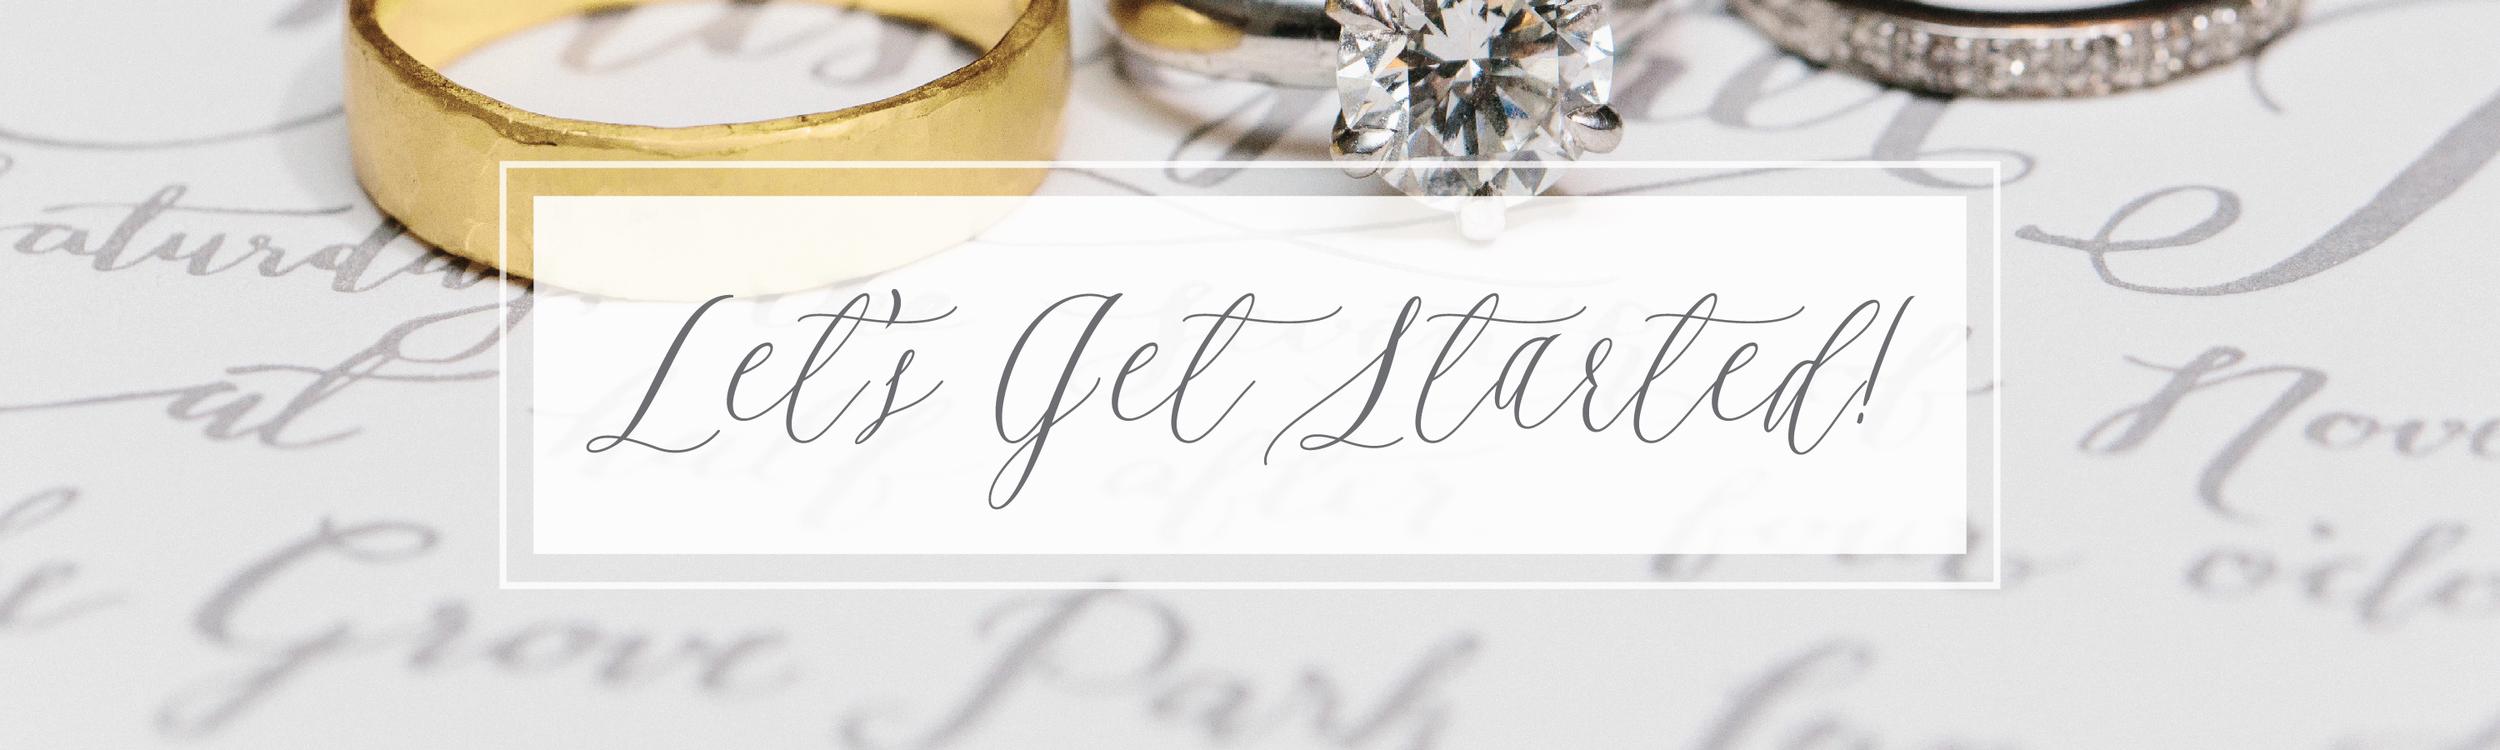 Custom Wedding Invite Heading-01.jpg